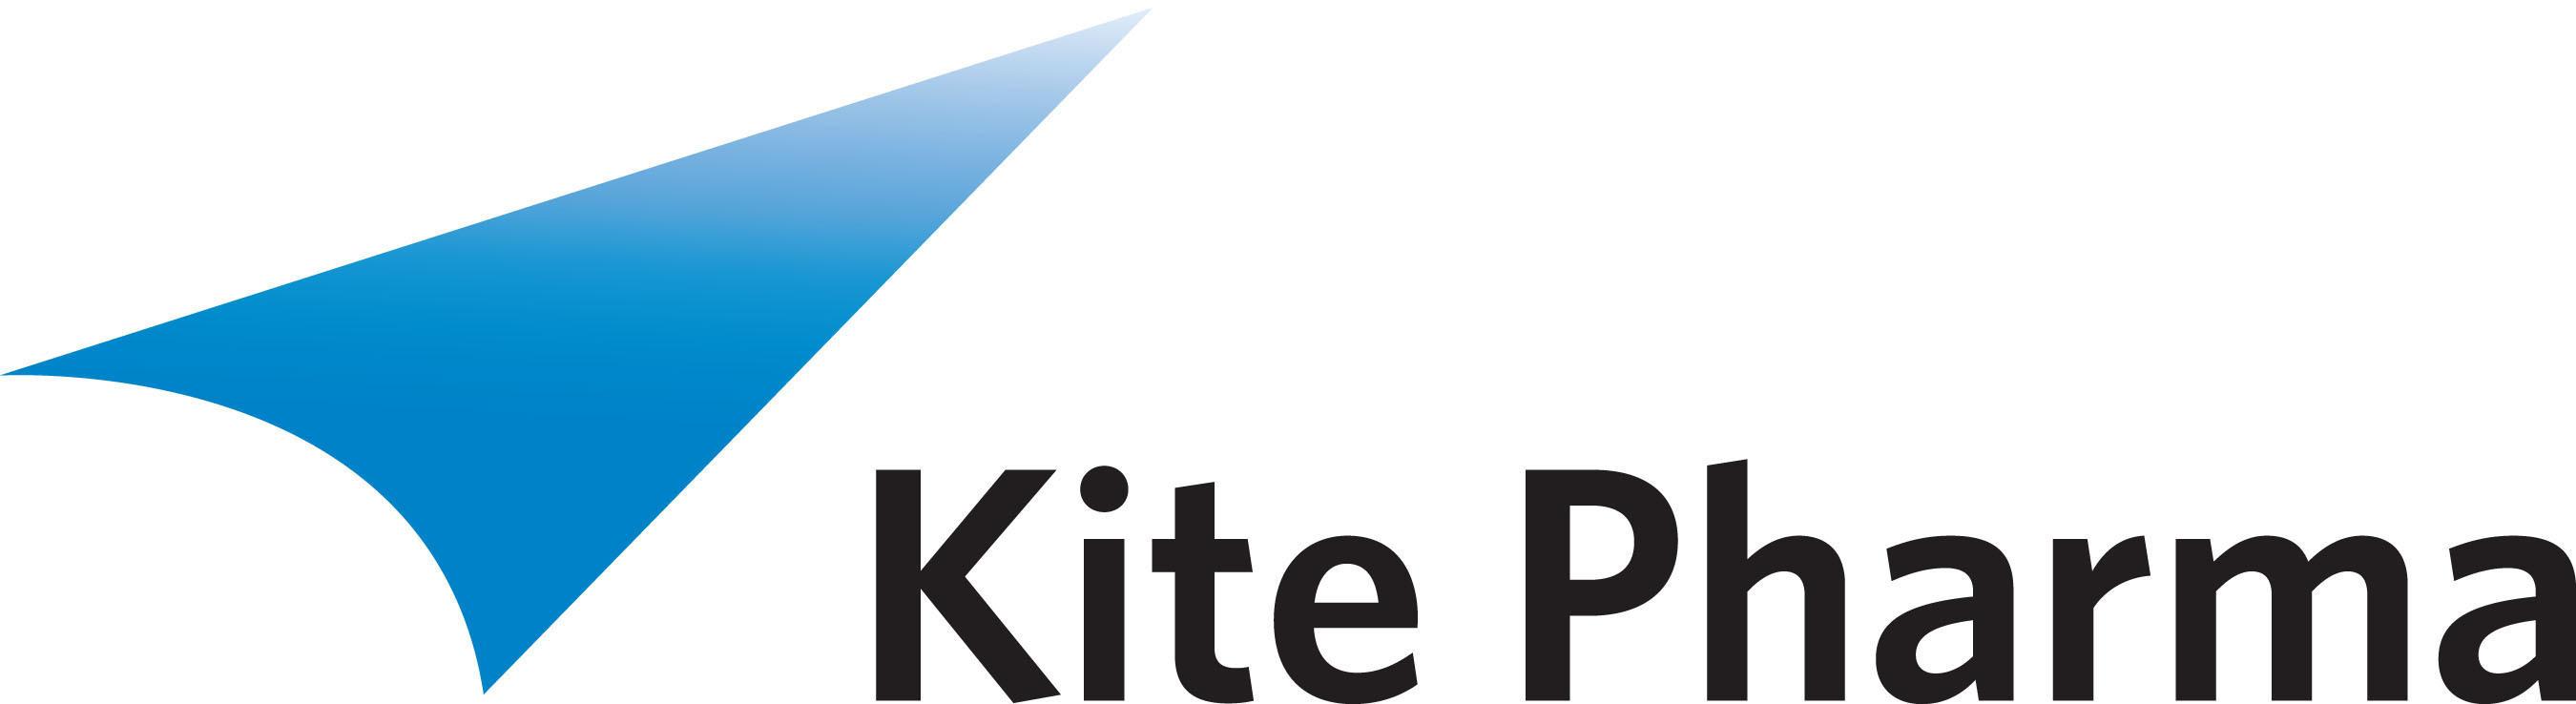 «Кайт фарма» (Kite Pharma).